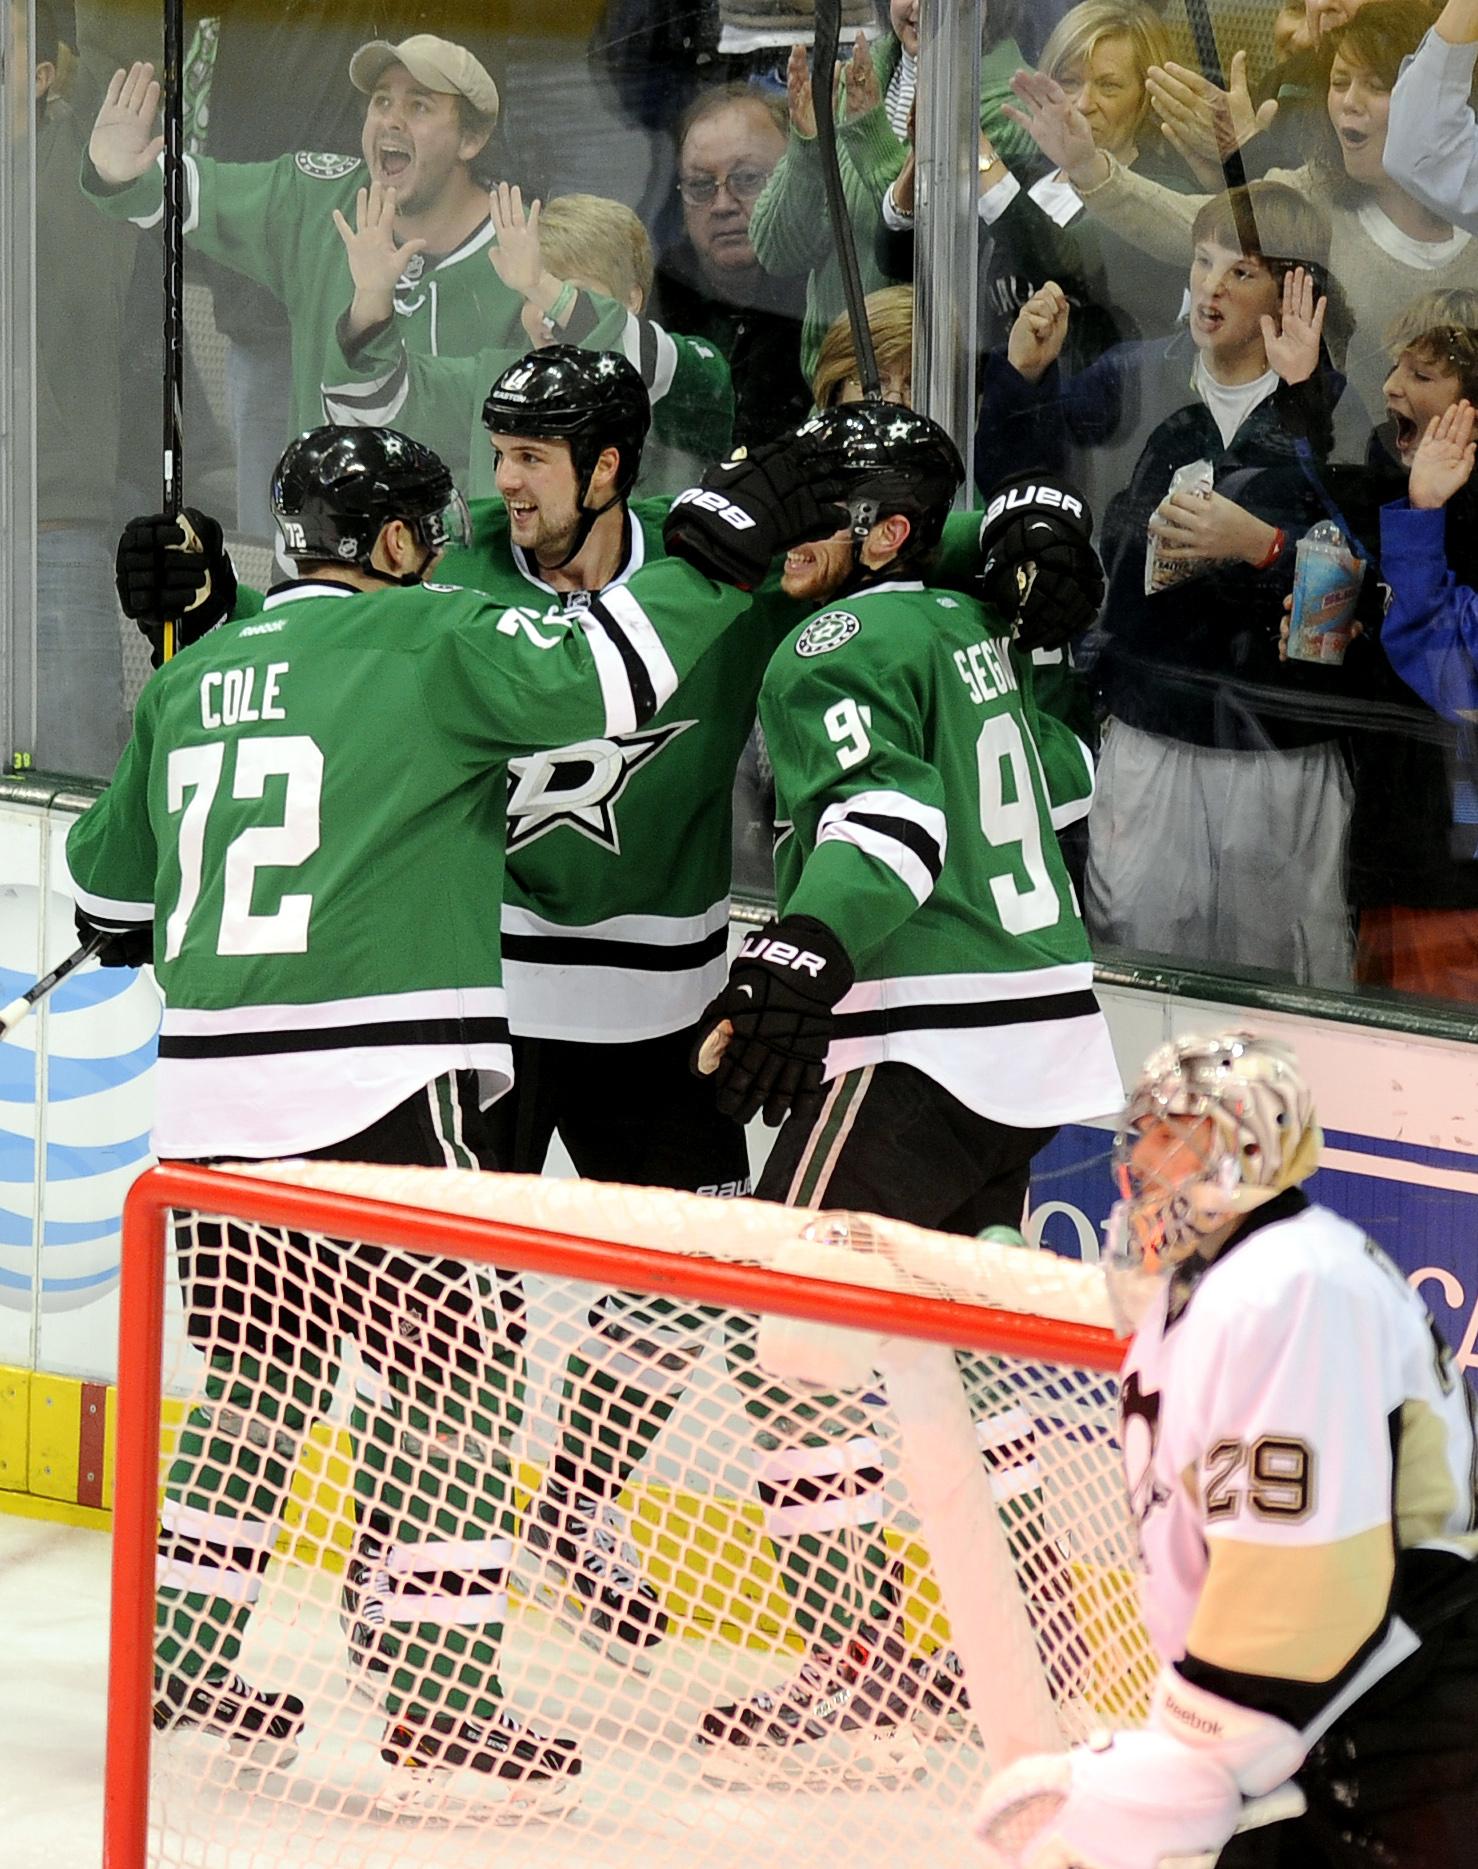 Lehtonen shuts out Penguins as Stars win 3-0